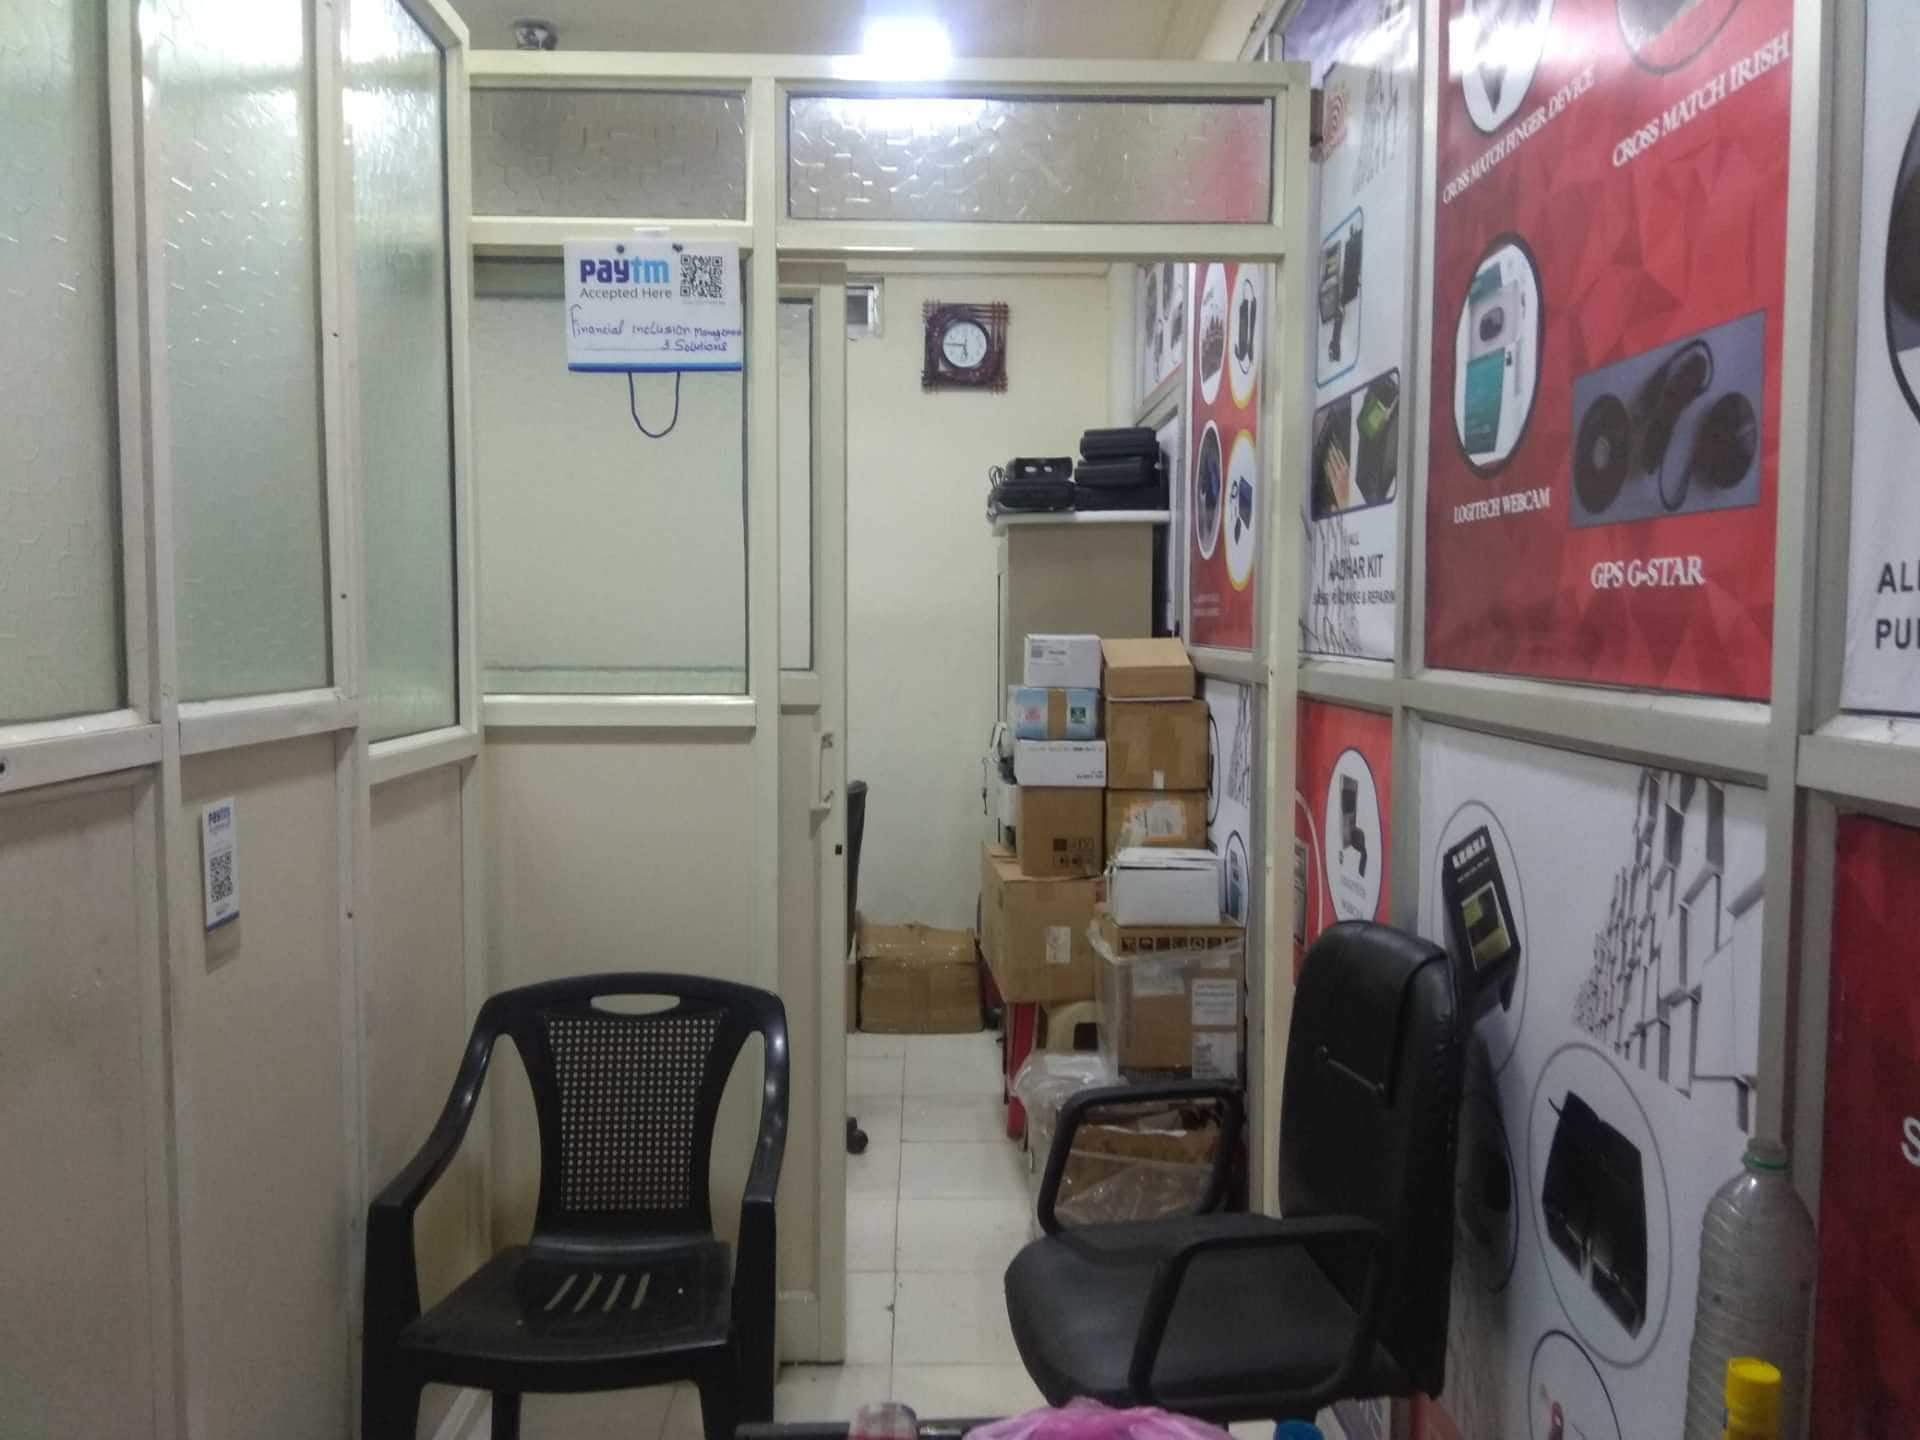 Top Morpho Fingerprint Scanner Distributors in Bhopal - Best Morpho